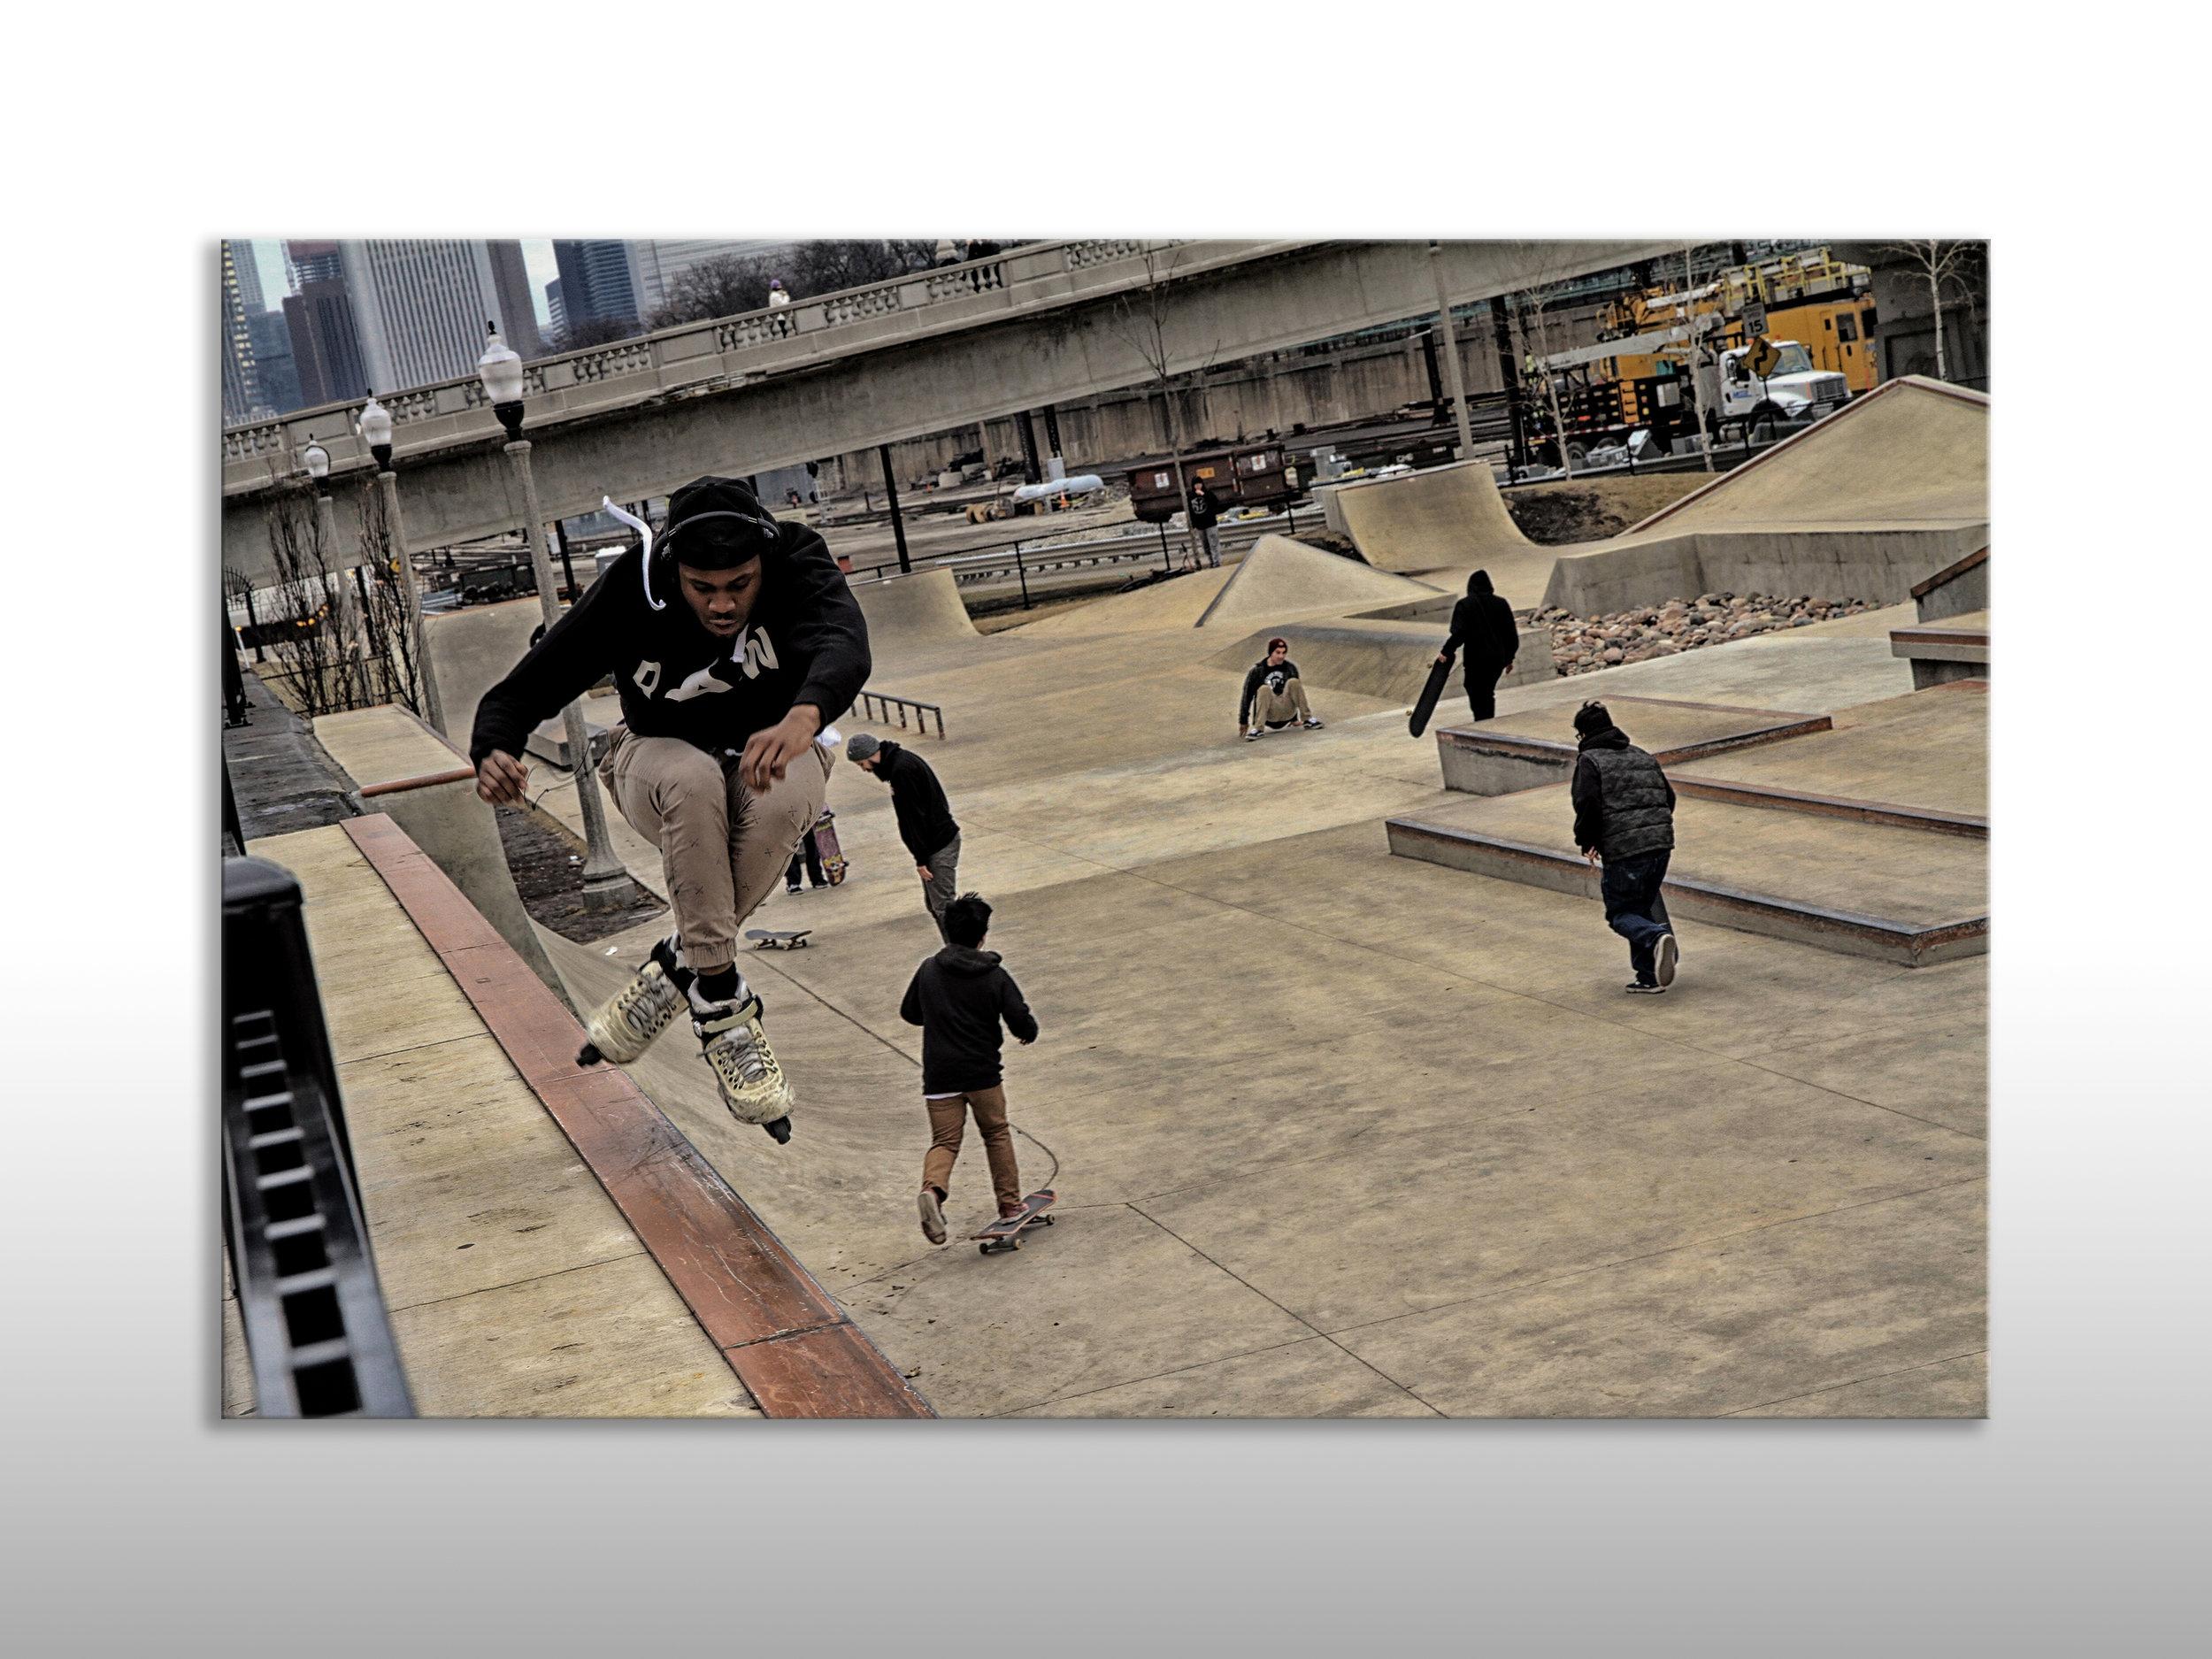 Skate Park 1.jpg